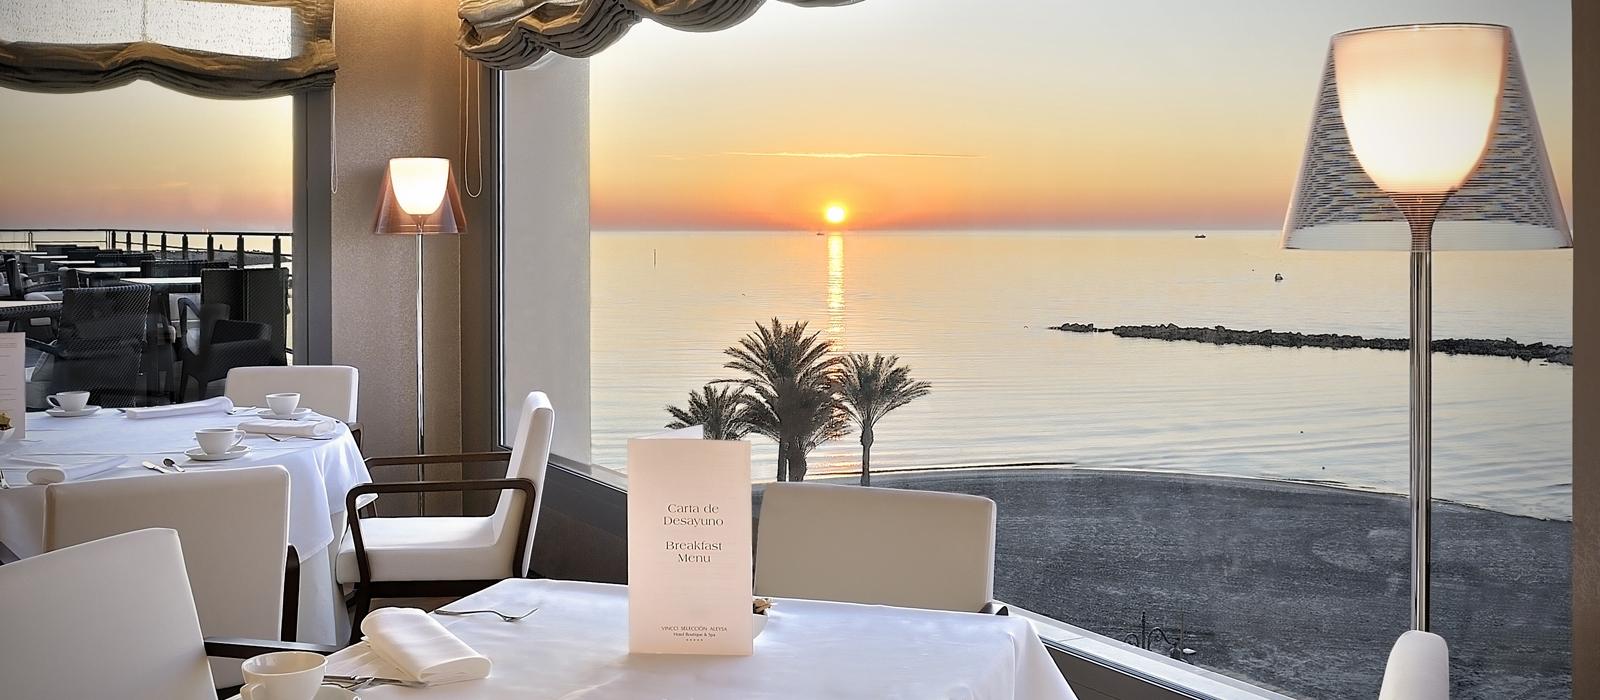 Restaurant Hôtel Aleysa Boutique & Spa - Vincci Hoteles